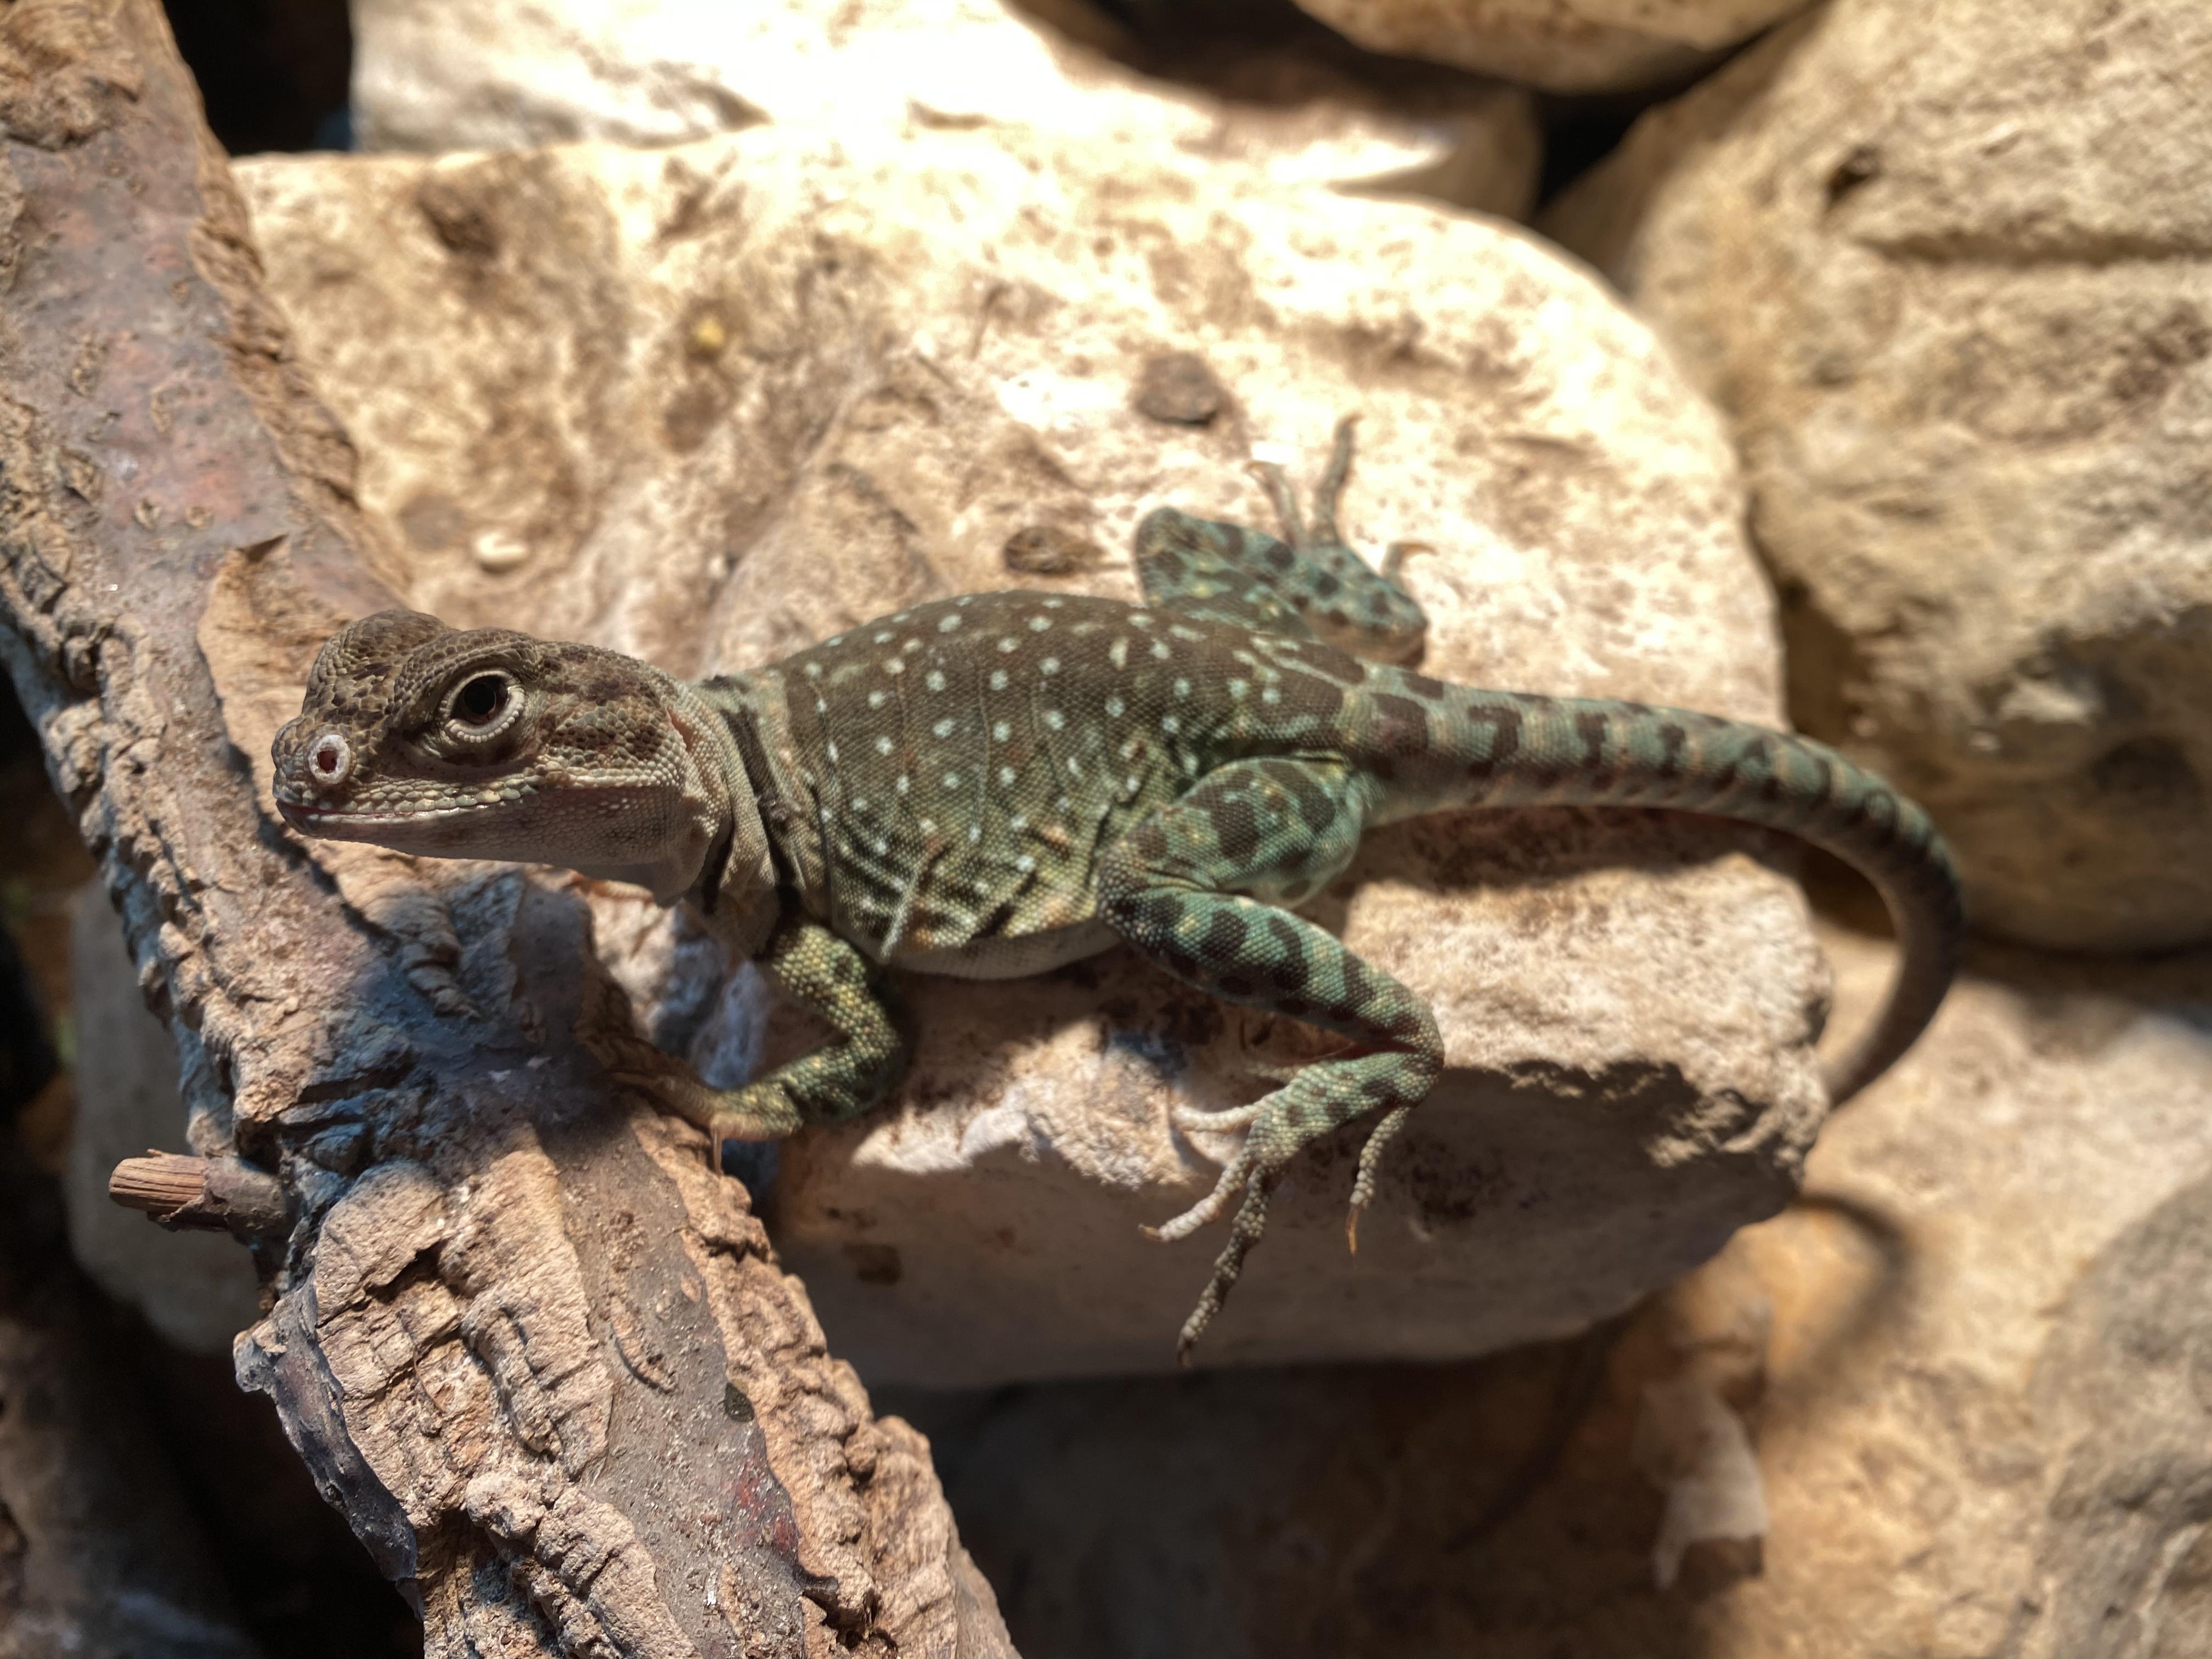 Collared Lizard Pair Blazing Blue line-13c5f506-49c6-4121-bb91-966650d6ac1e_1594224973789.jpeg